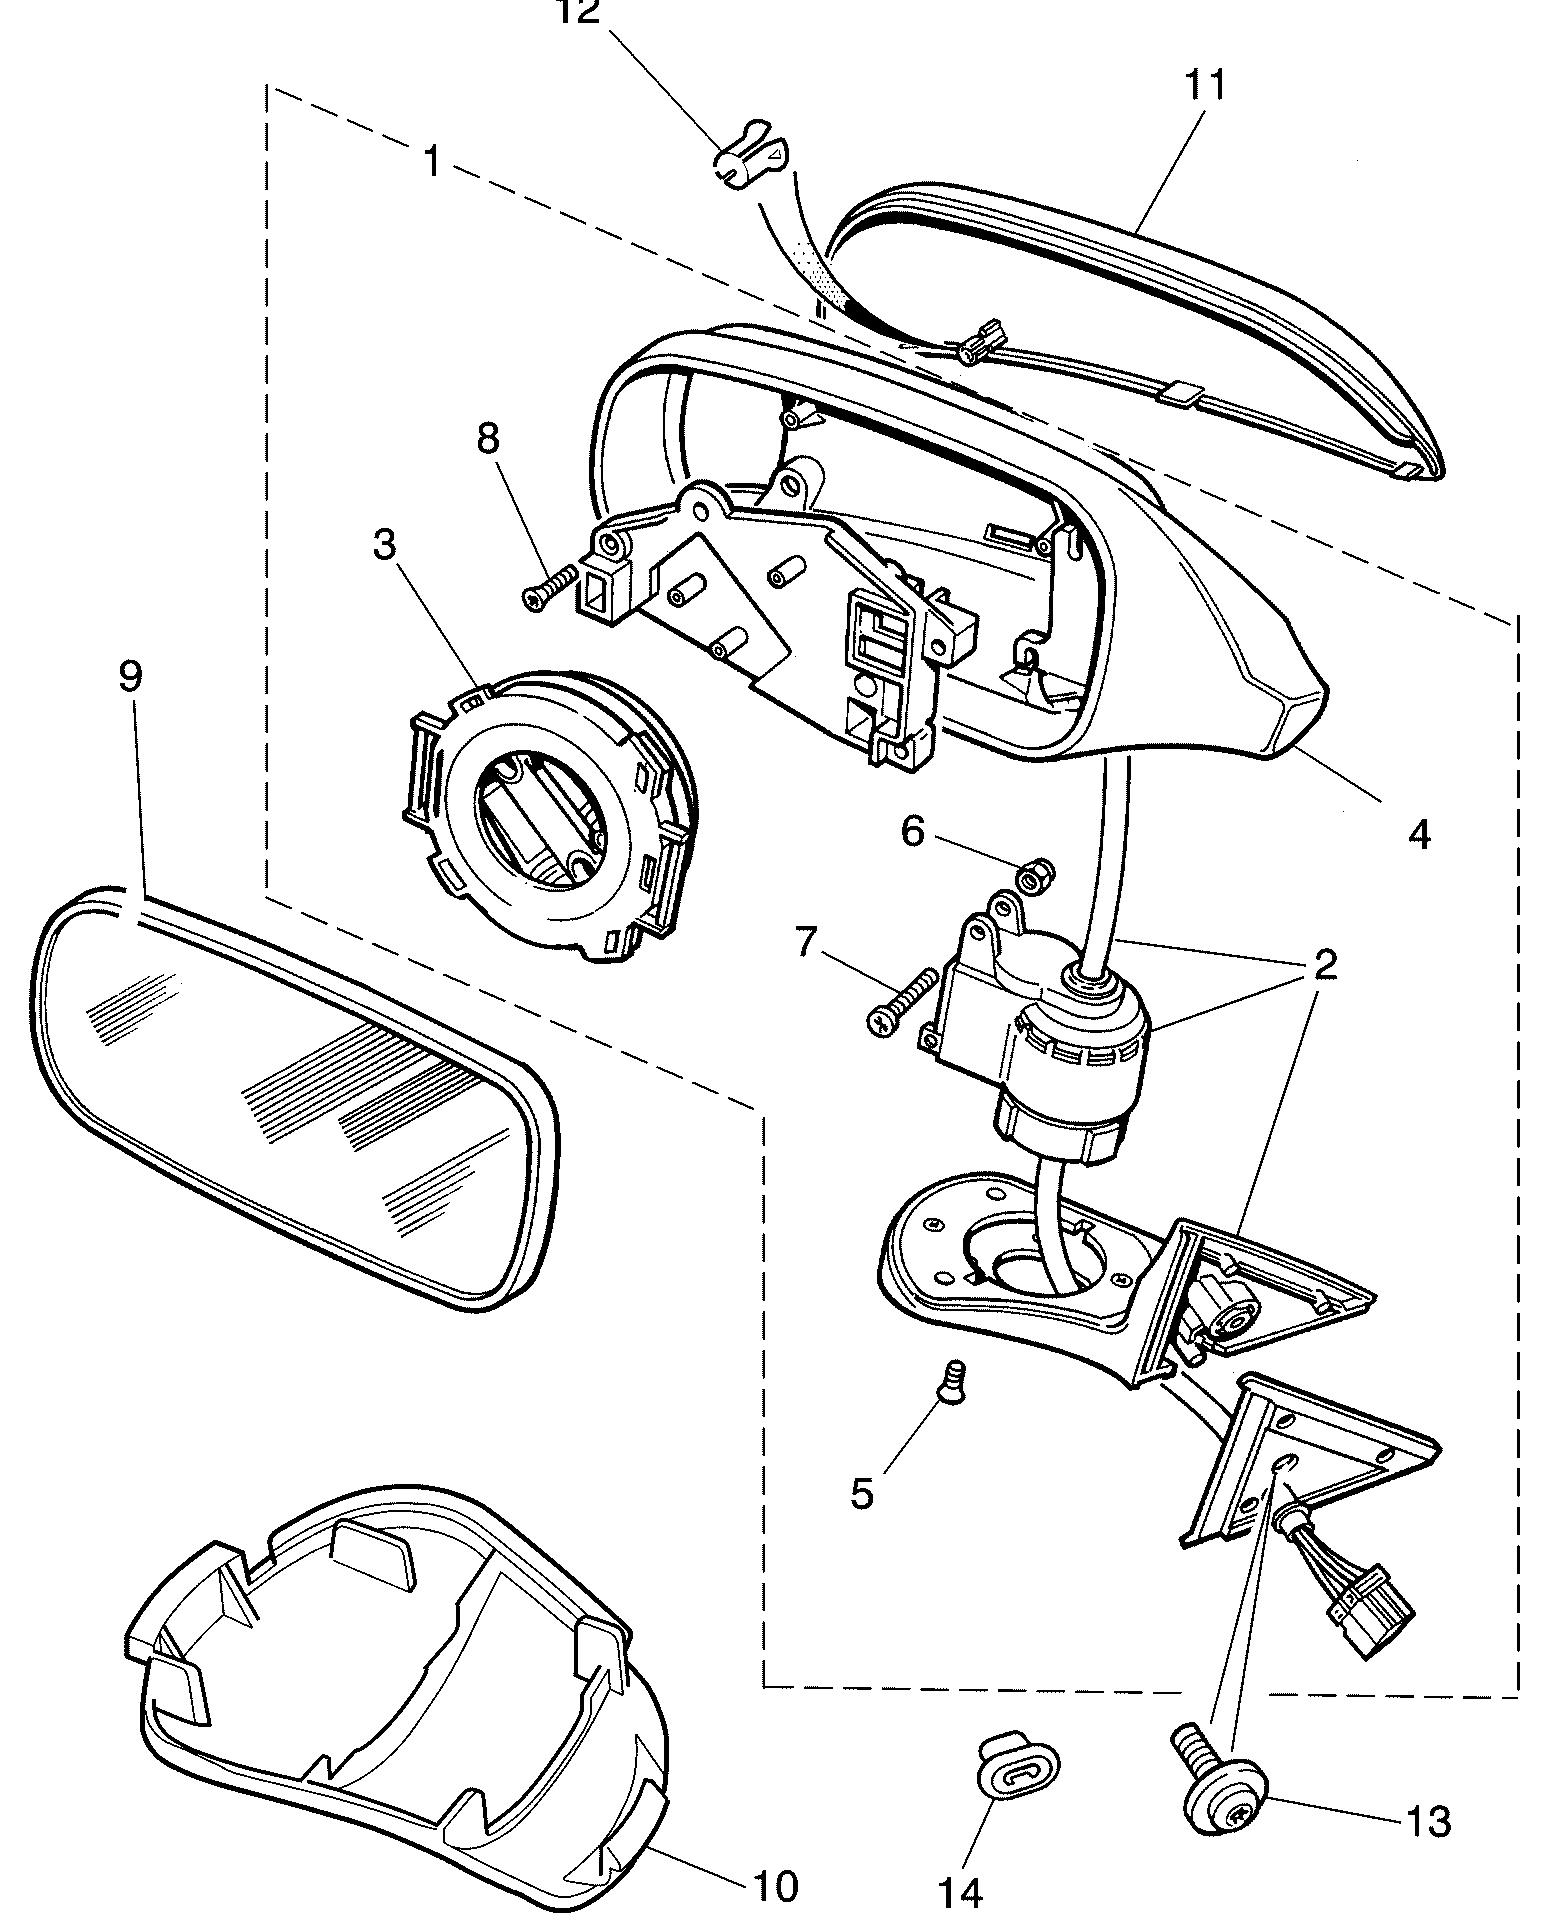 XJ8 ab 1997, XJ6/XJ12 ab 1994 und XKR8 Seitenspiegelglas